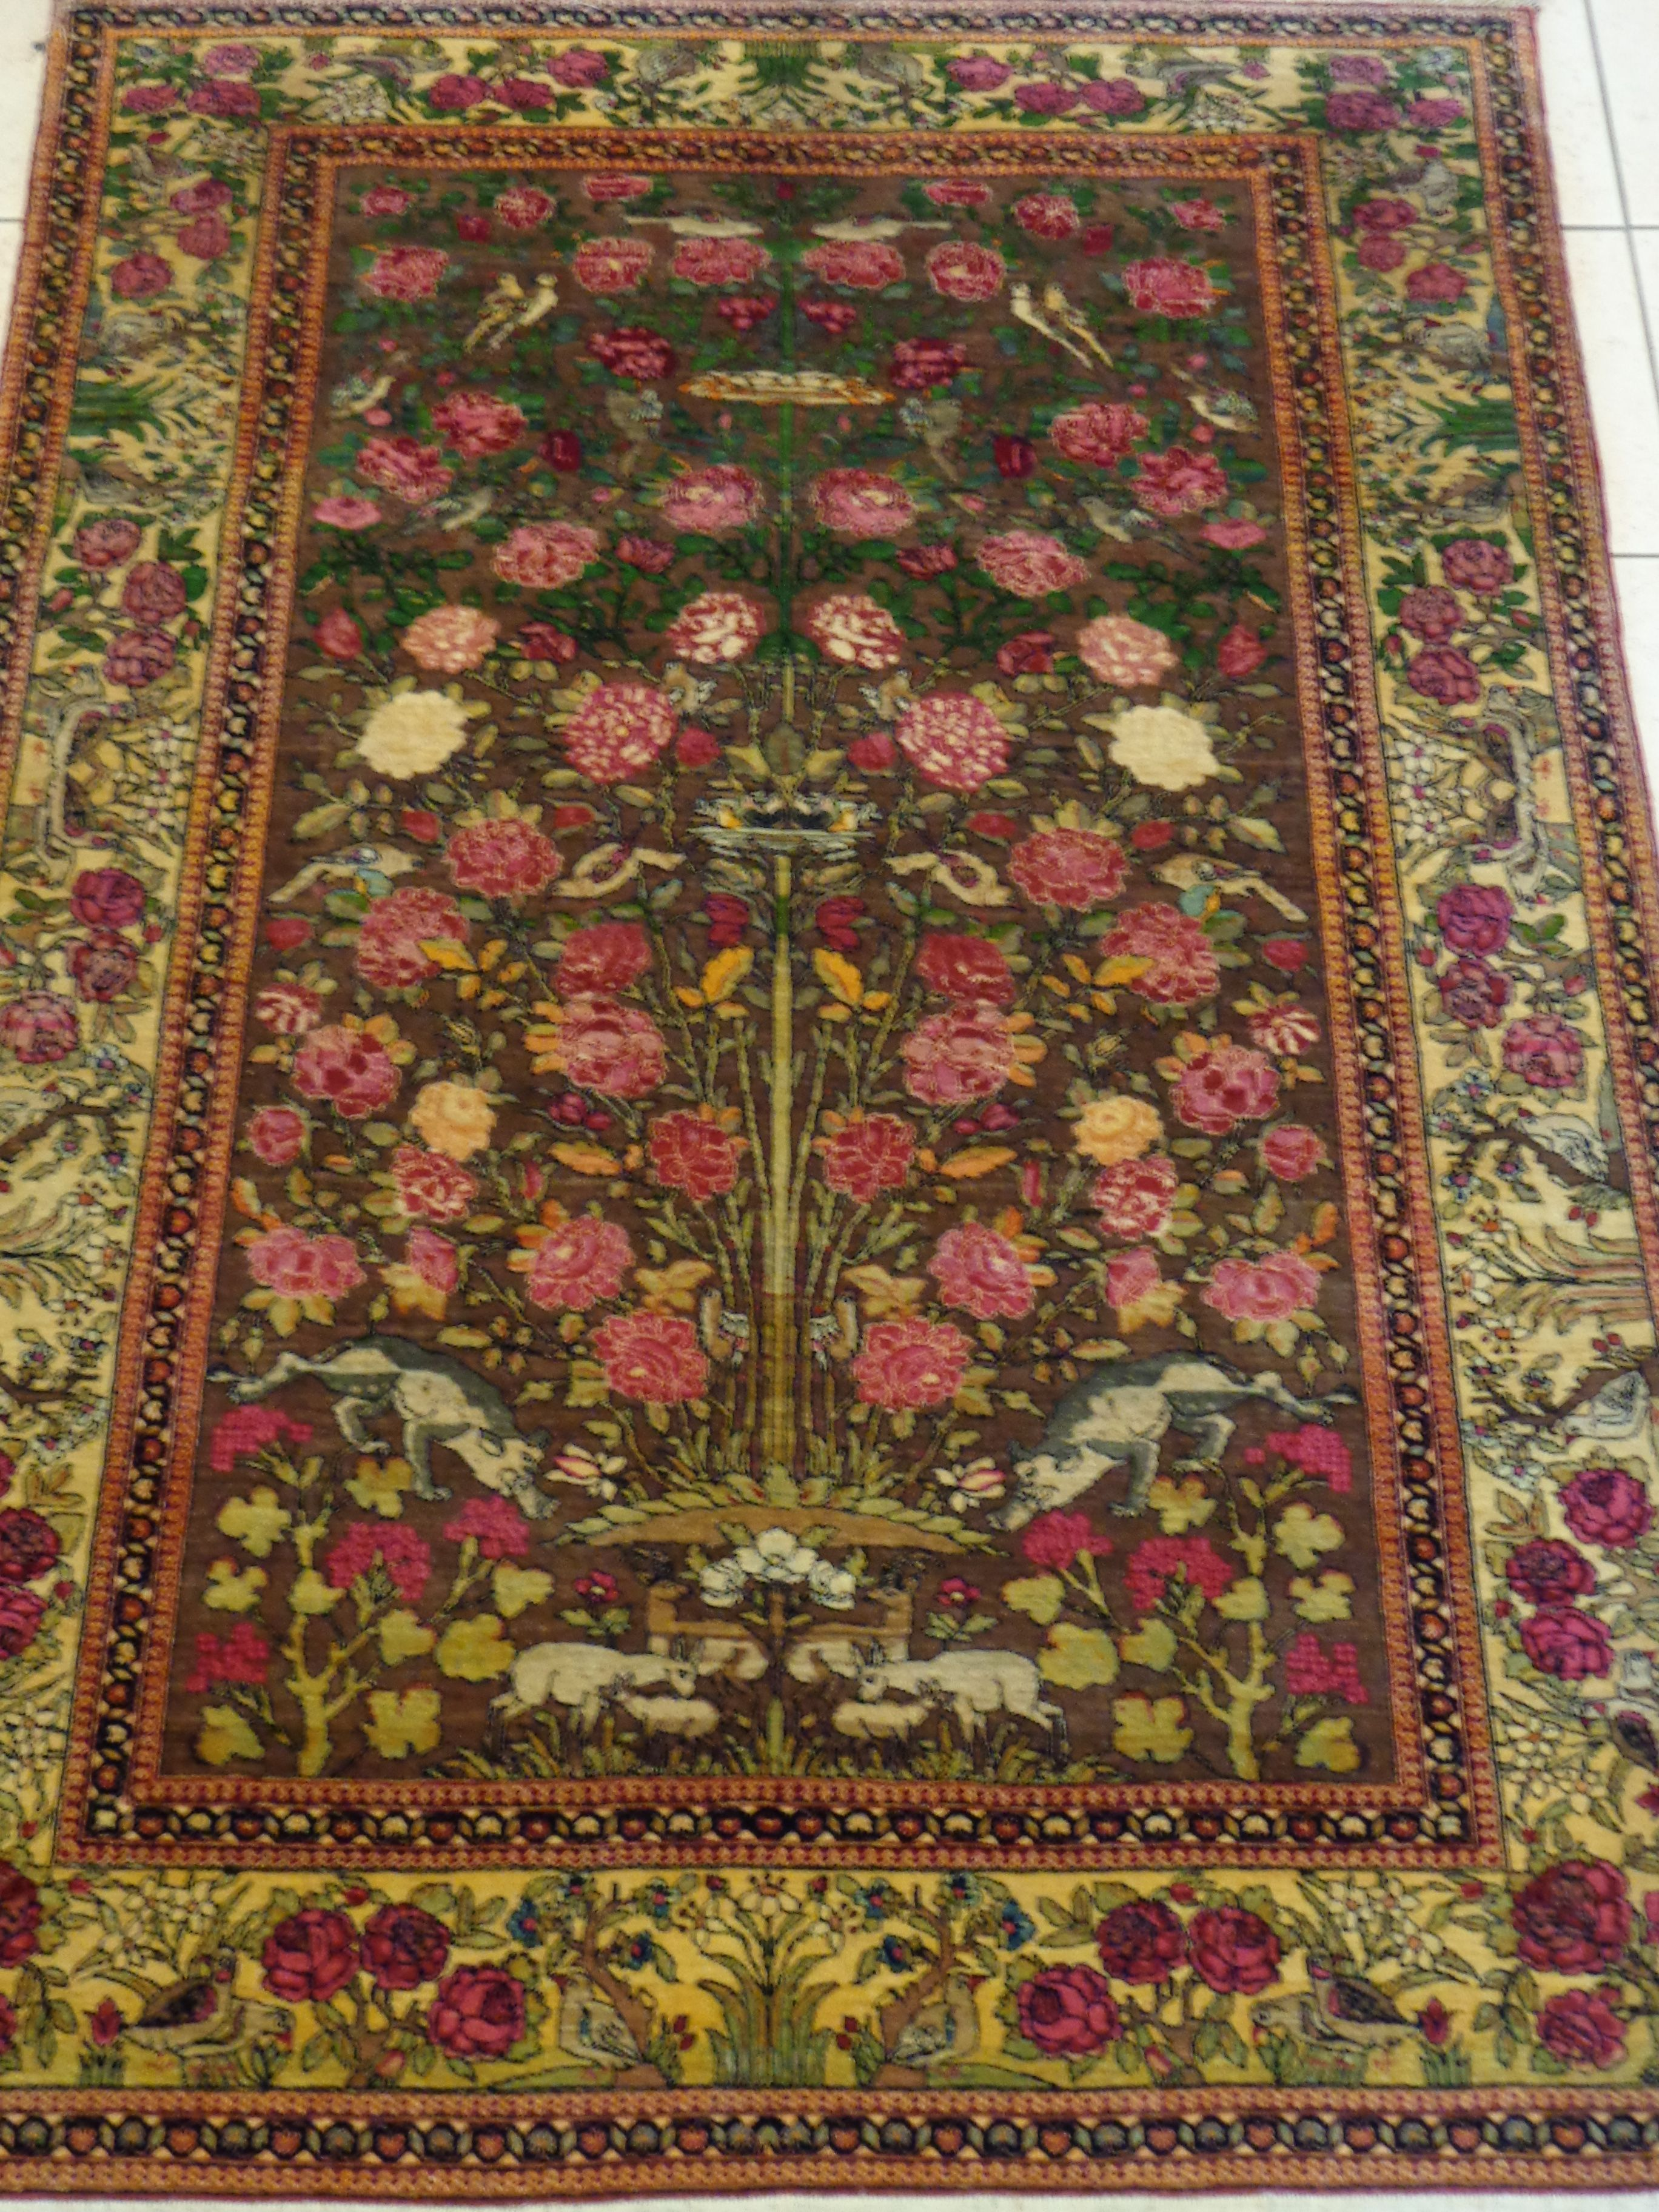 Persian Isfahan Ahmad Carpet Darius Germany Rugs On Carpet Rugs Oriental Carpets